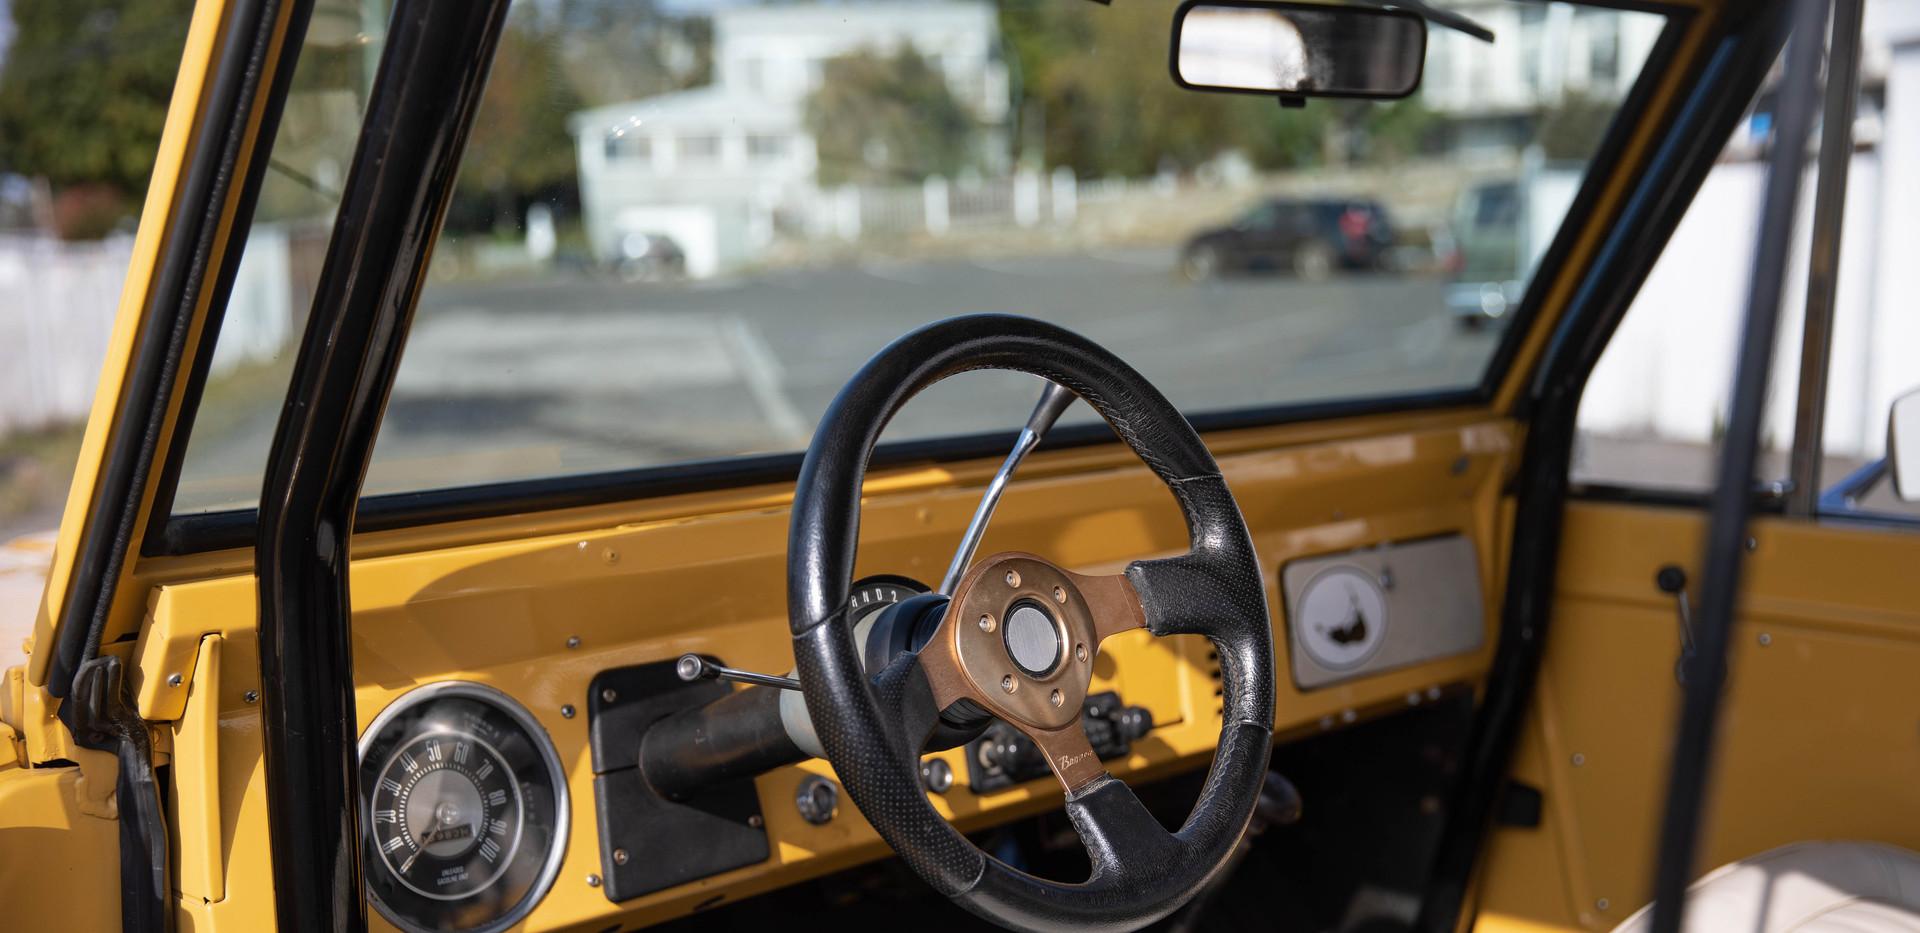 1977 Ford Bronco-7.jpg